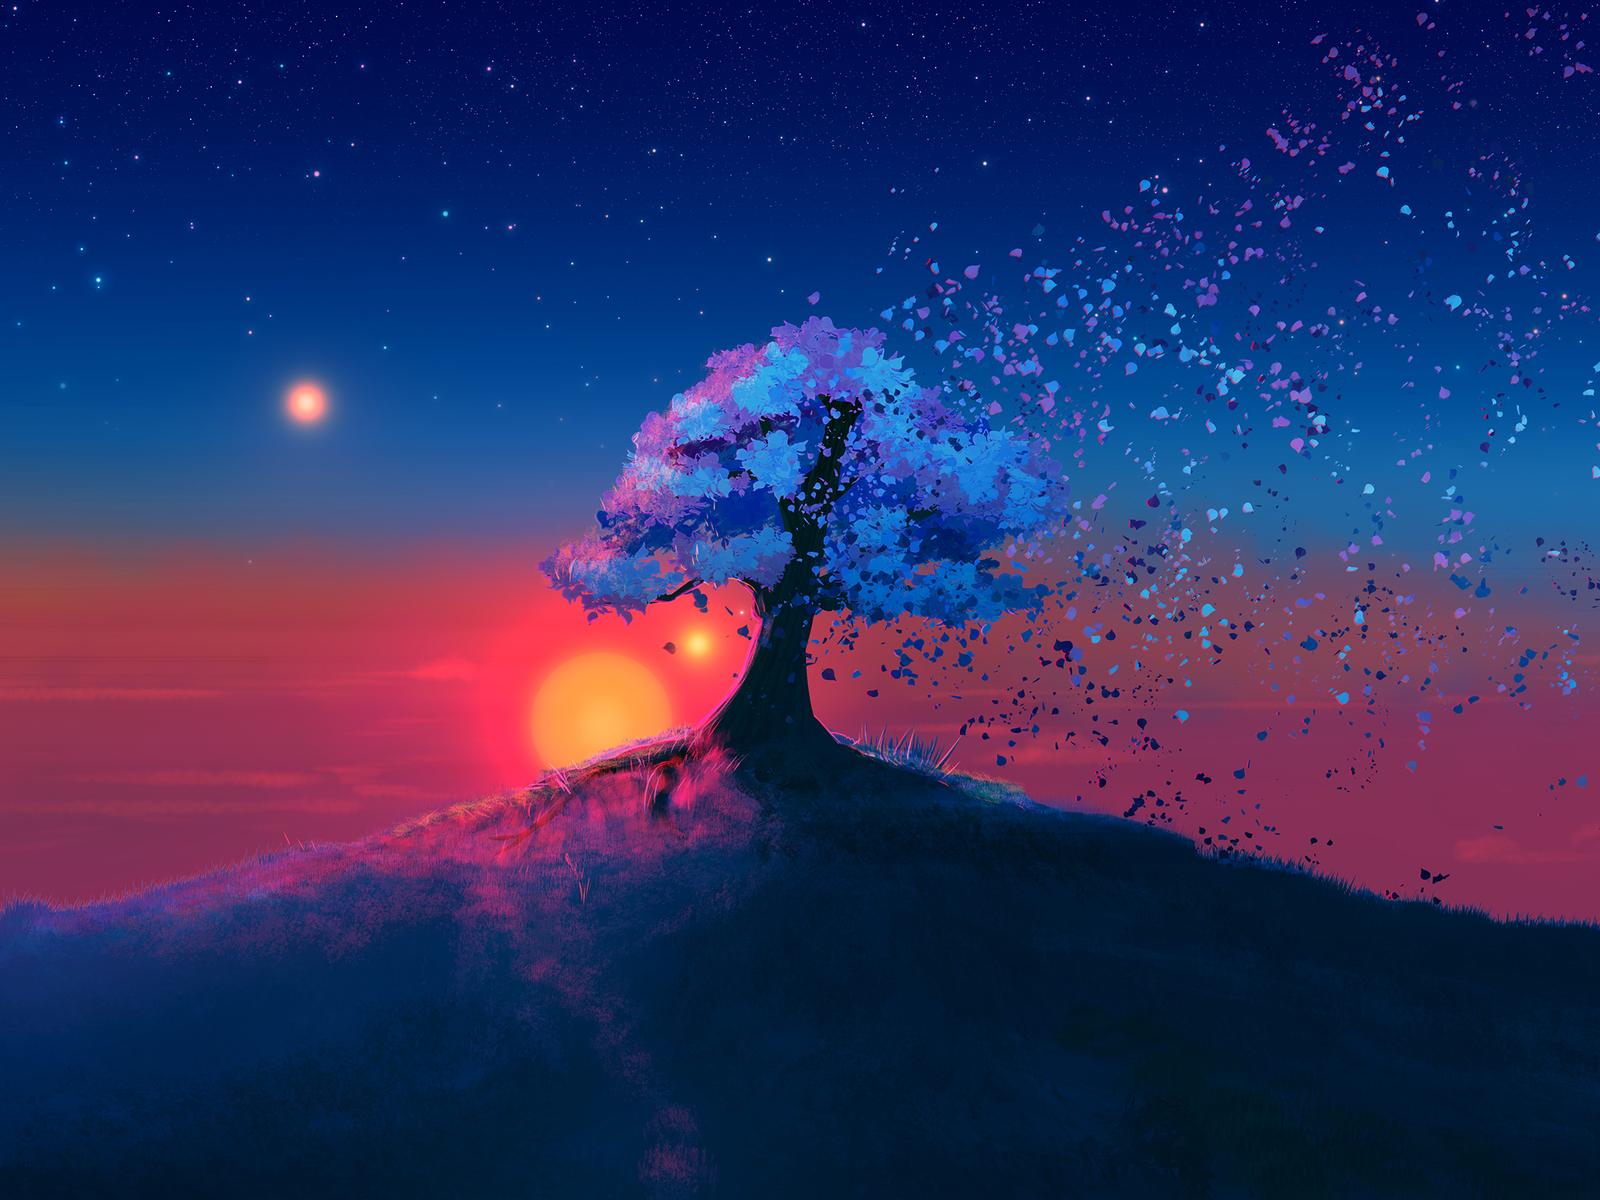 alone-tree-sunset-qe.jpg